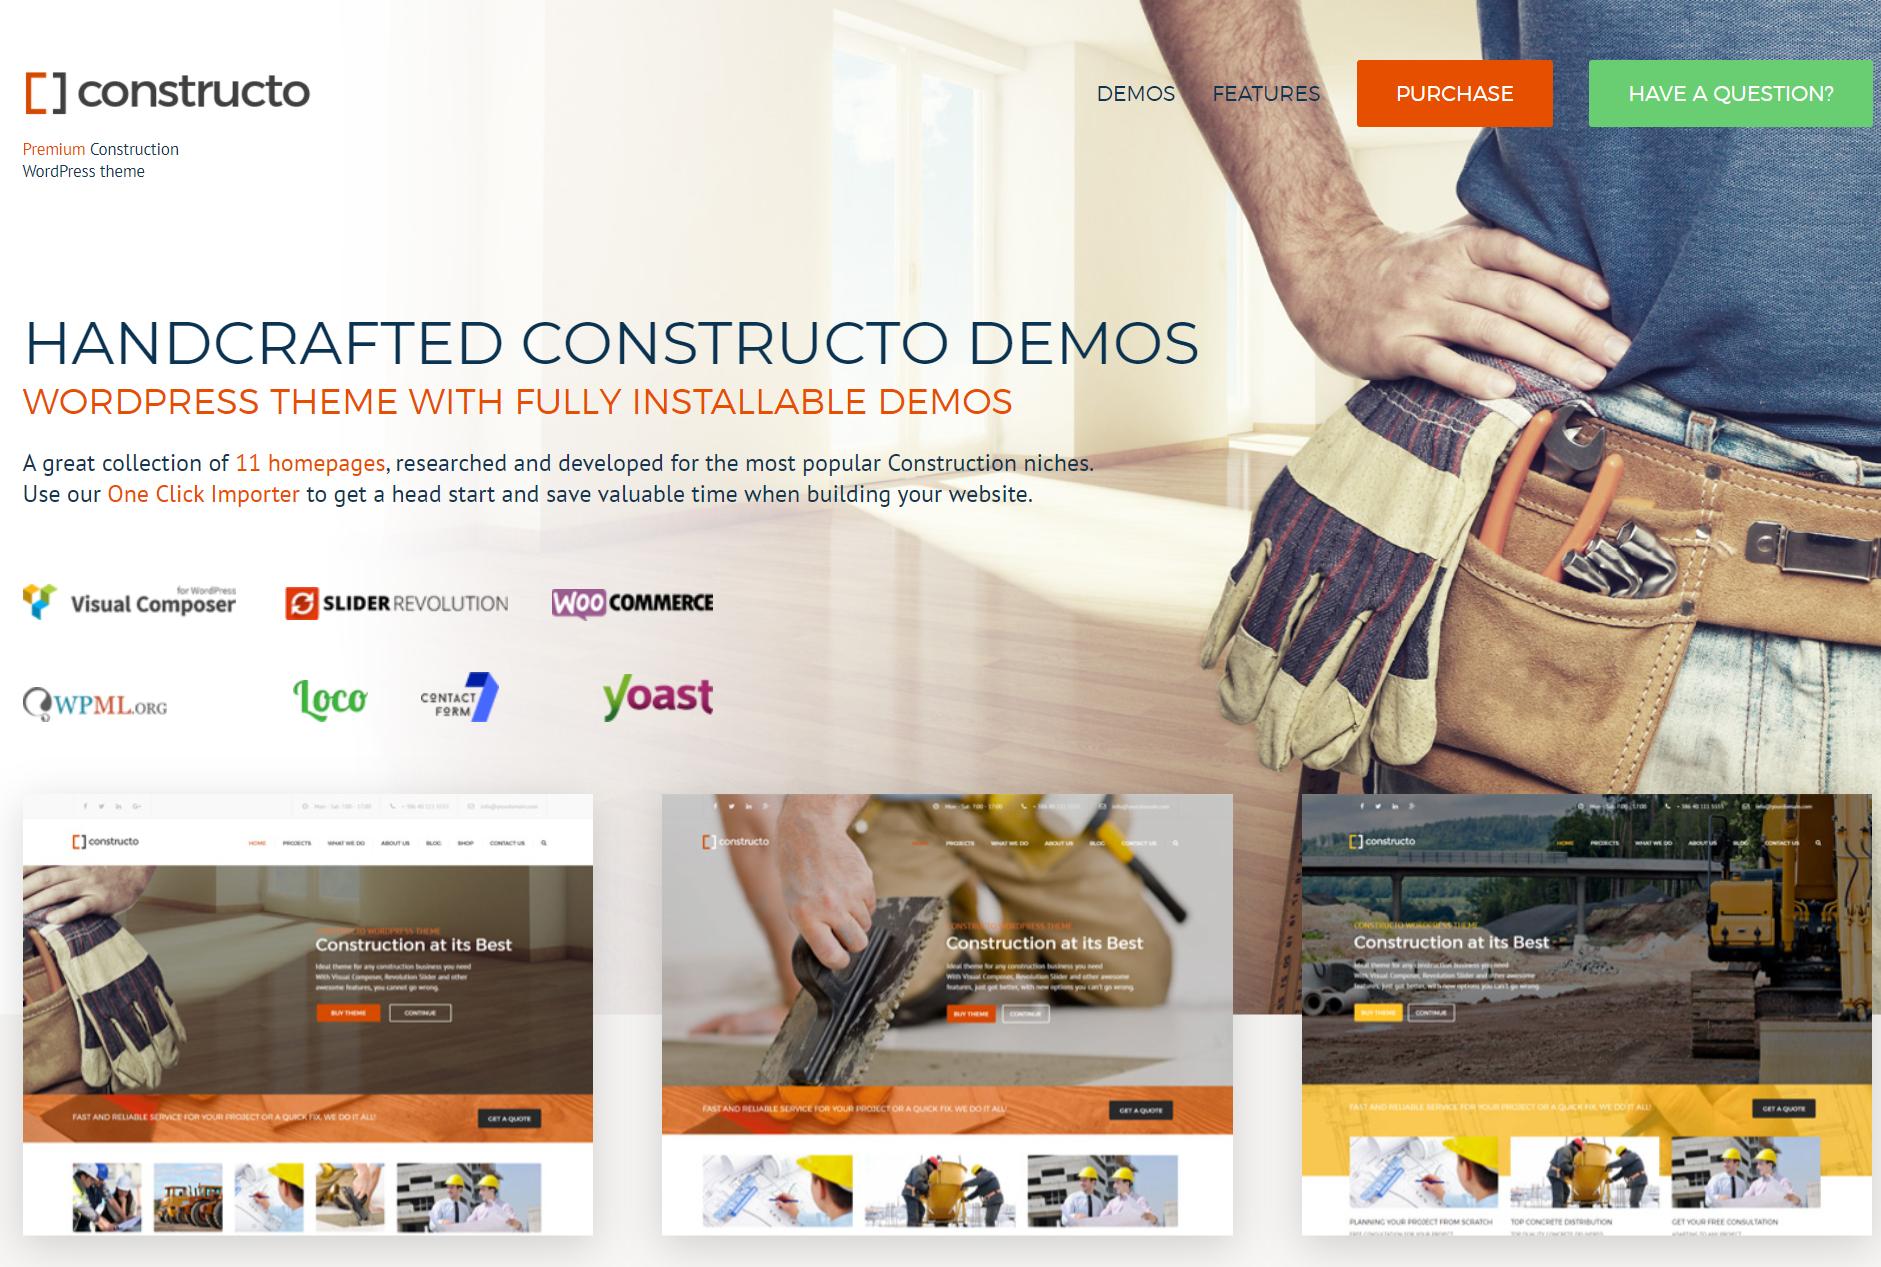 Constructo Premium WordPress Construction theme